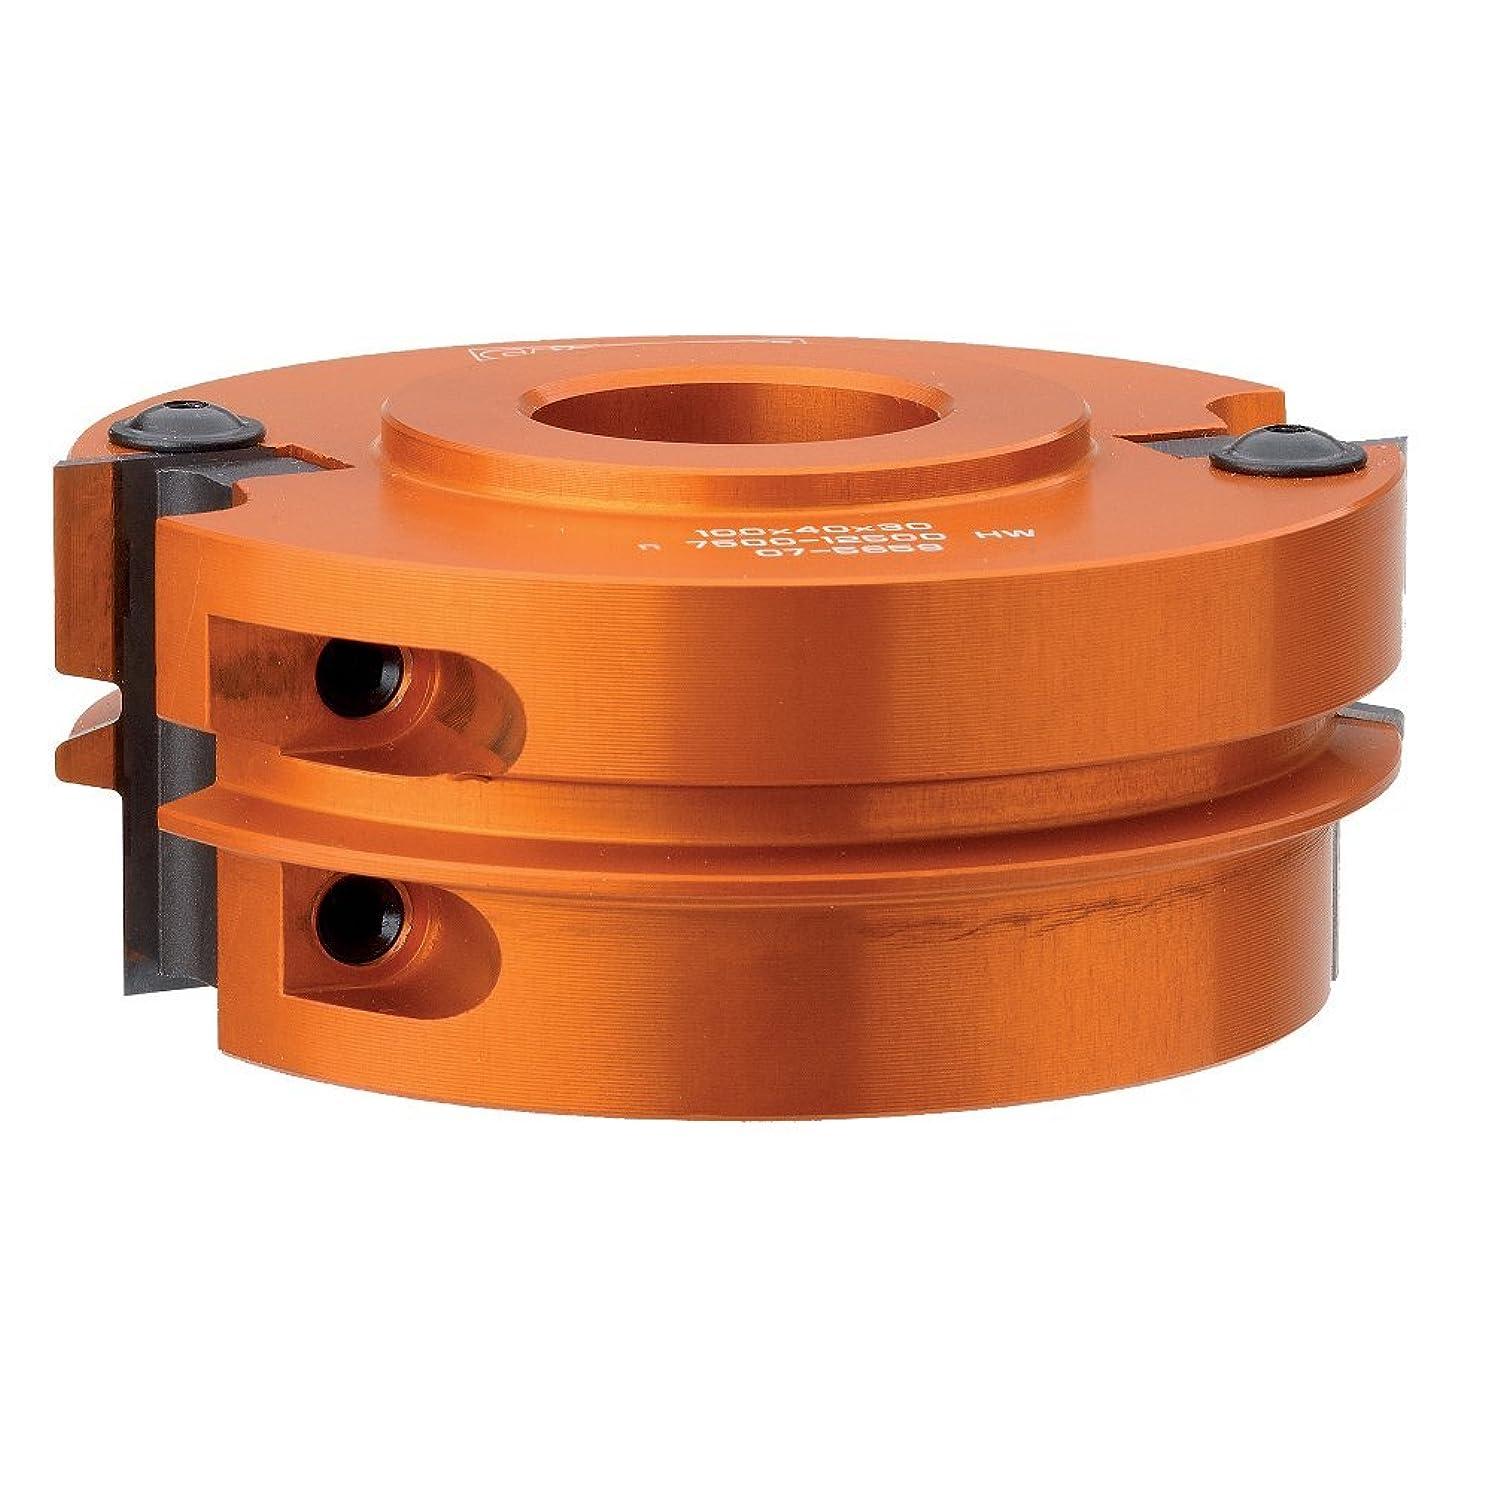 CMT 694.009.31 Reverse Glue Joint Cutter Head, 4-Inch Diameter, 1-1/4-Inch Bore